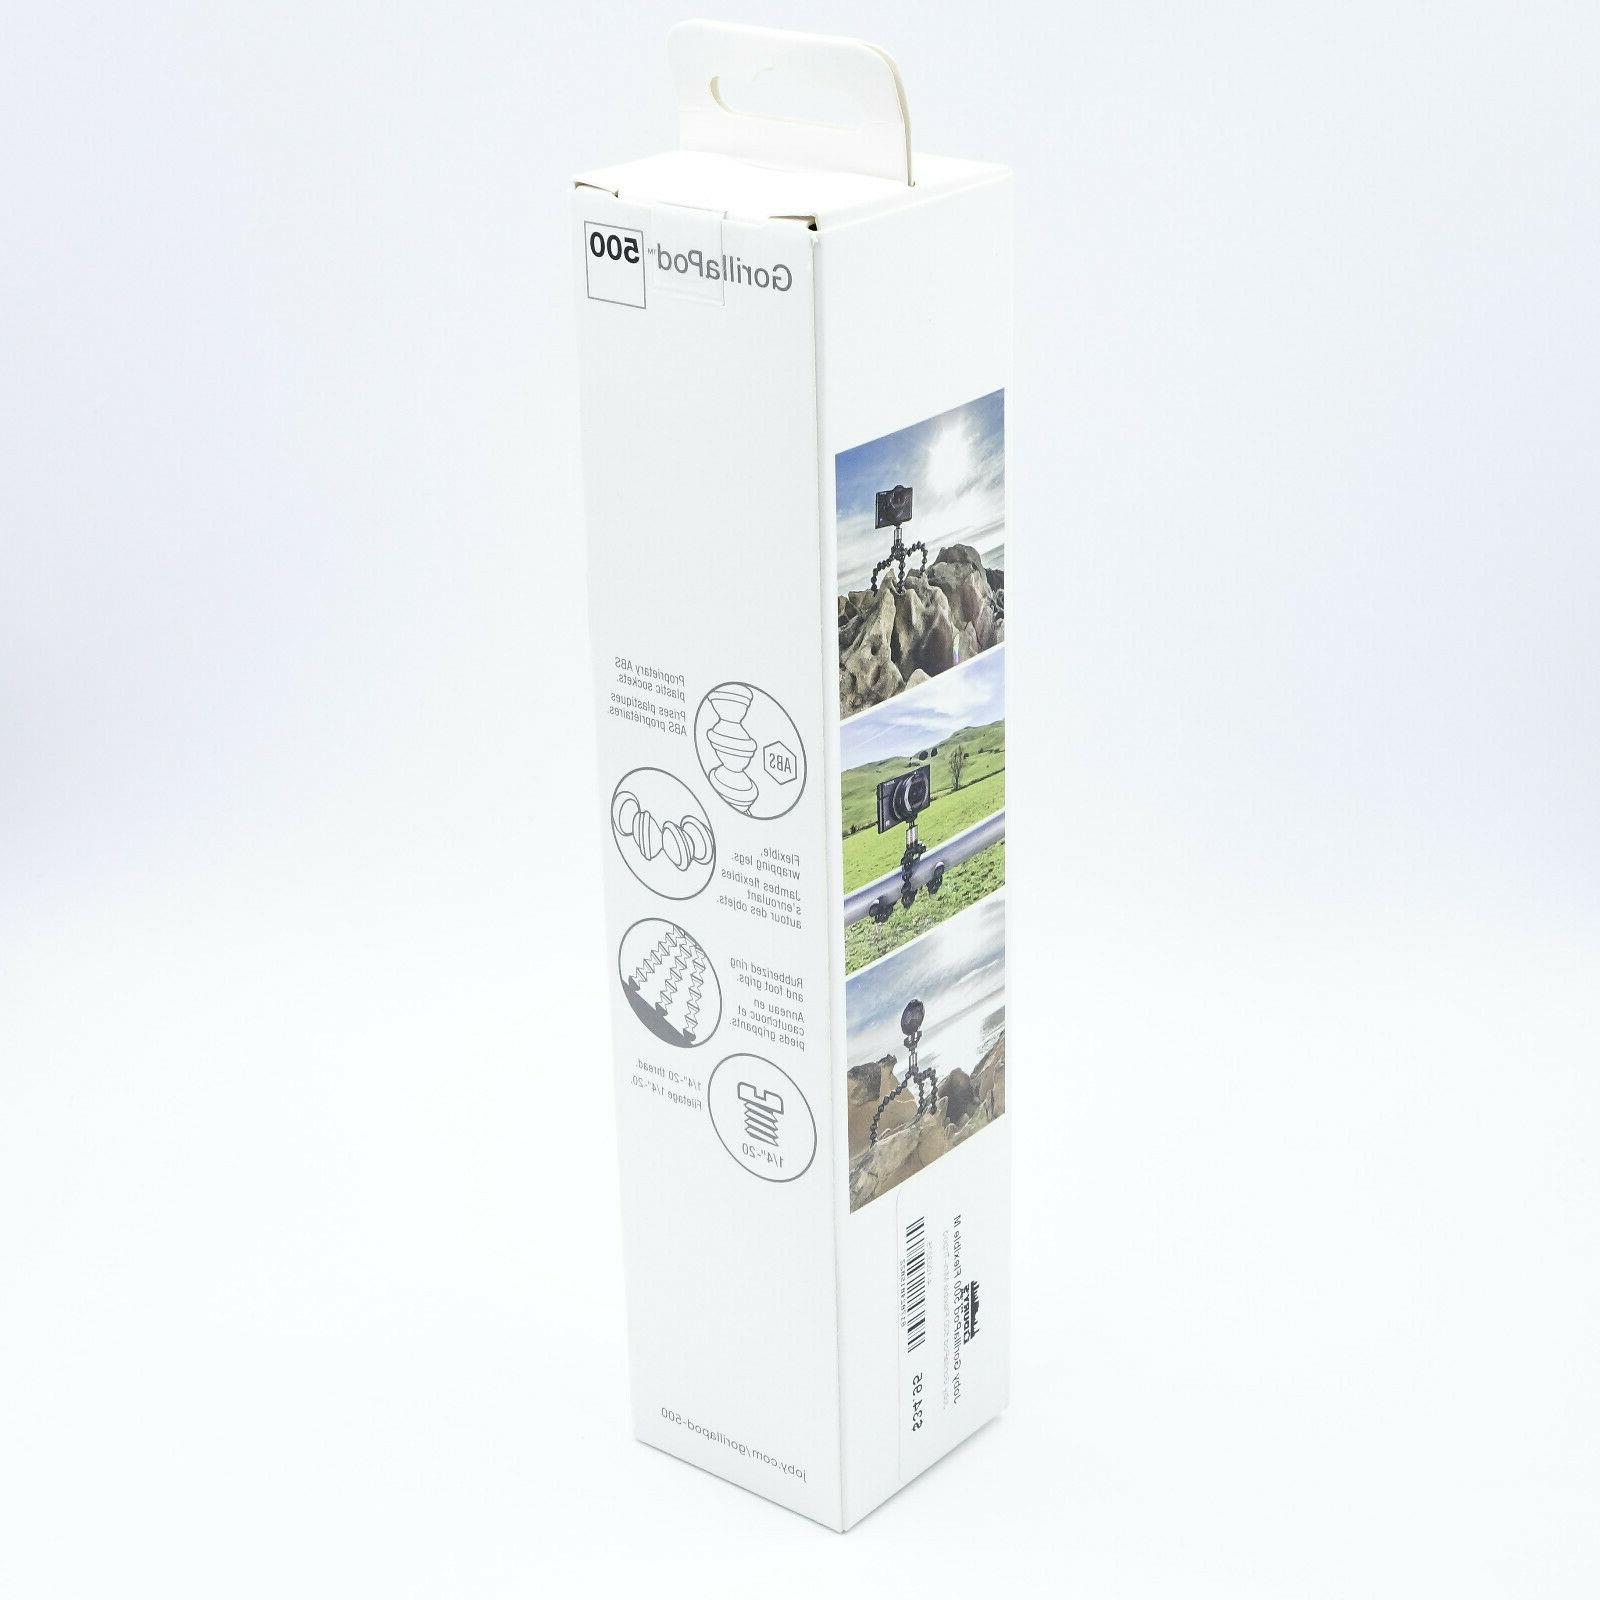 JOBY GorillaPod Flexible Mini-Tripod W/ GP500-01WW DR6169